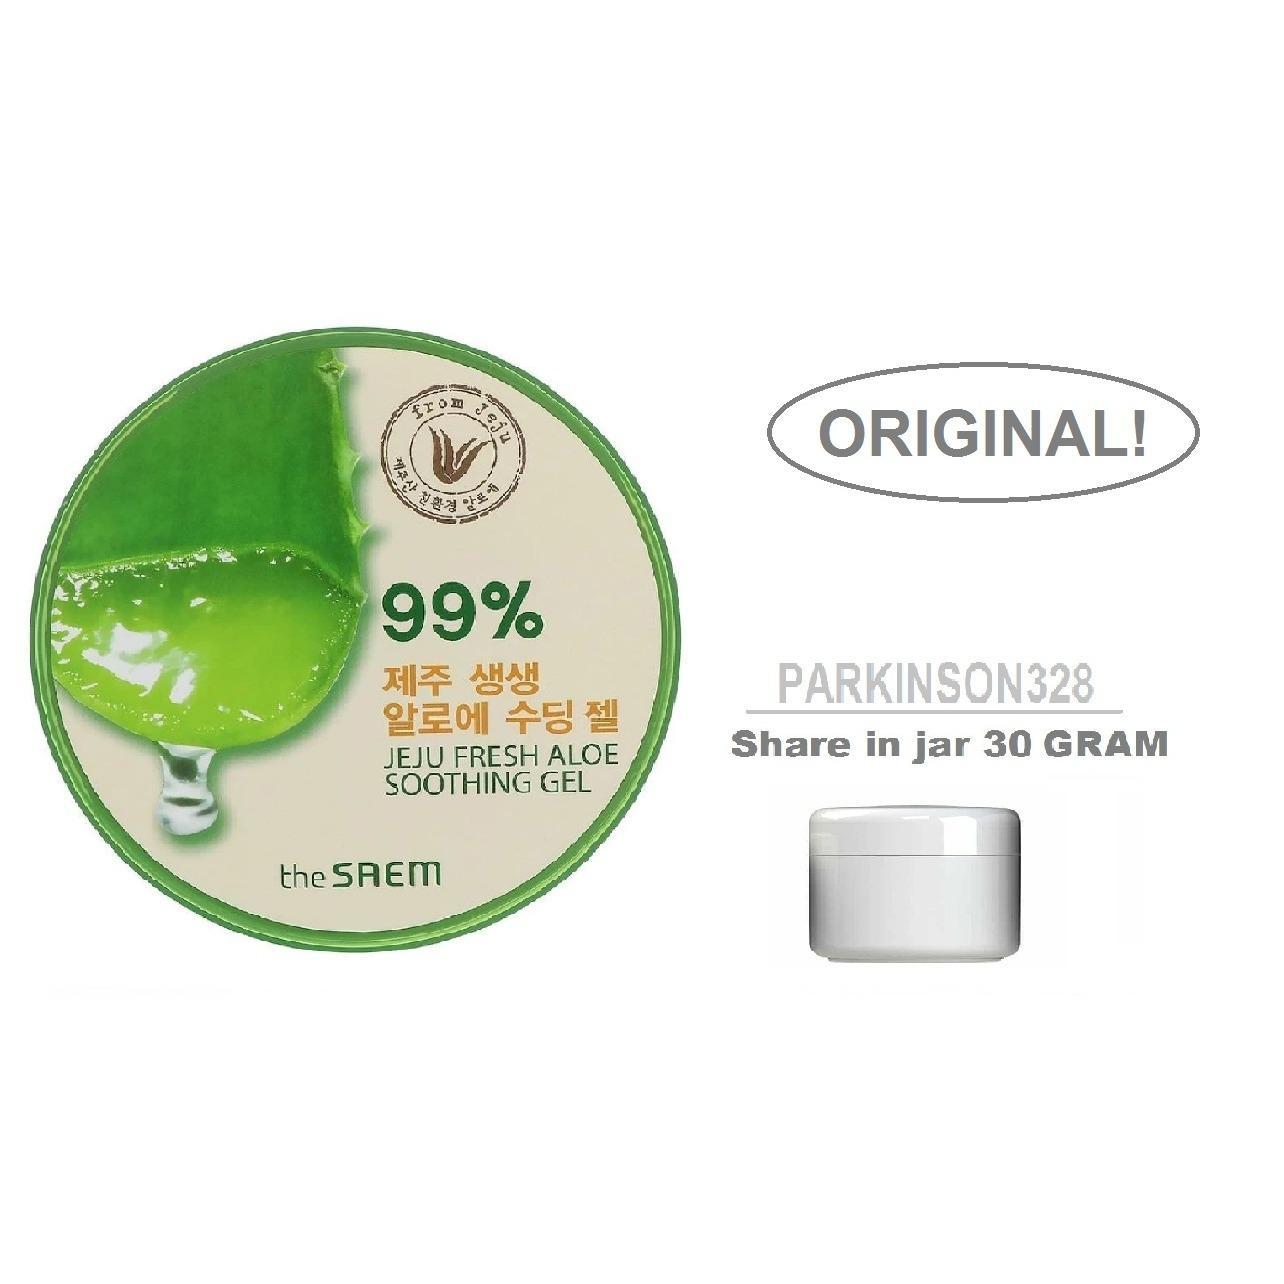 The Saem ORIGINAL Jeju Fresh Aloe Vera Soothing Gel 99% - Share in Jar 30